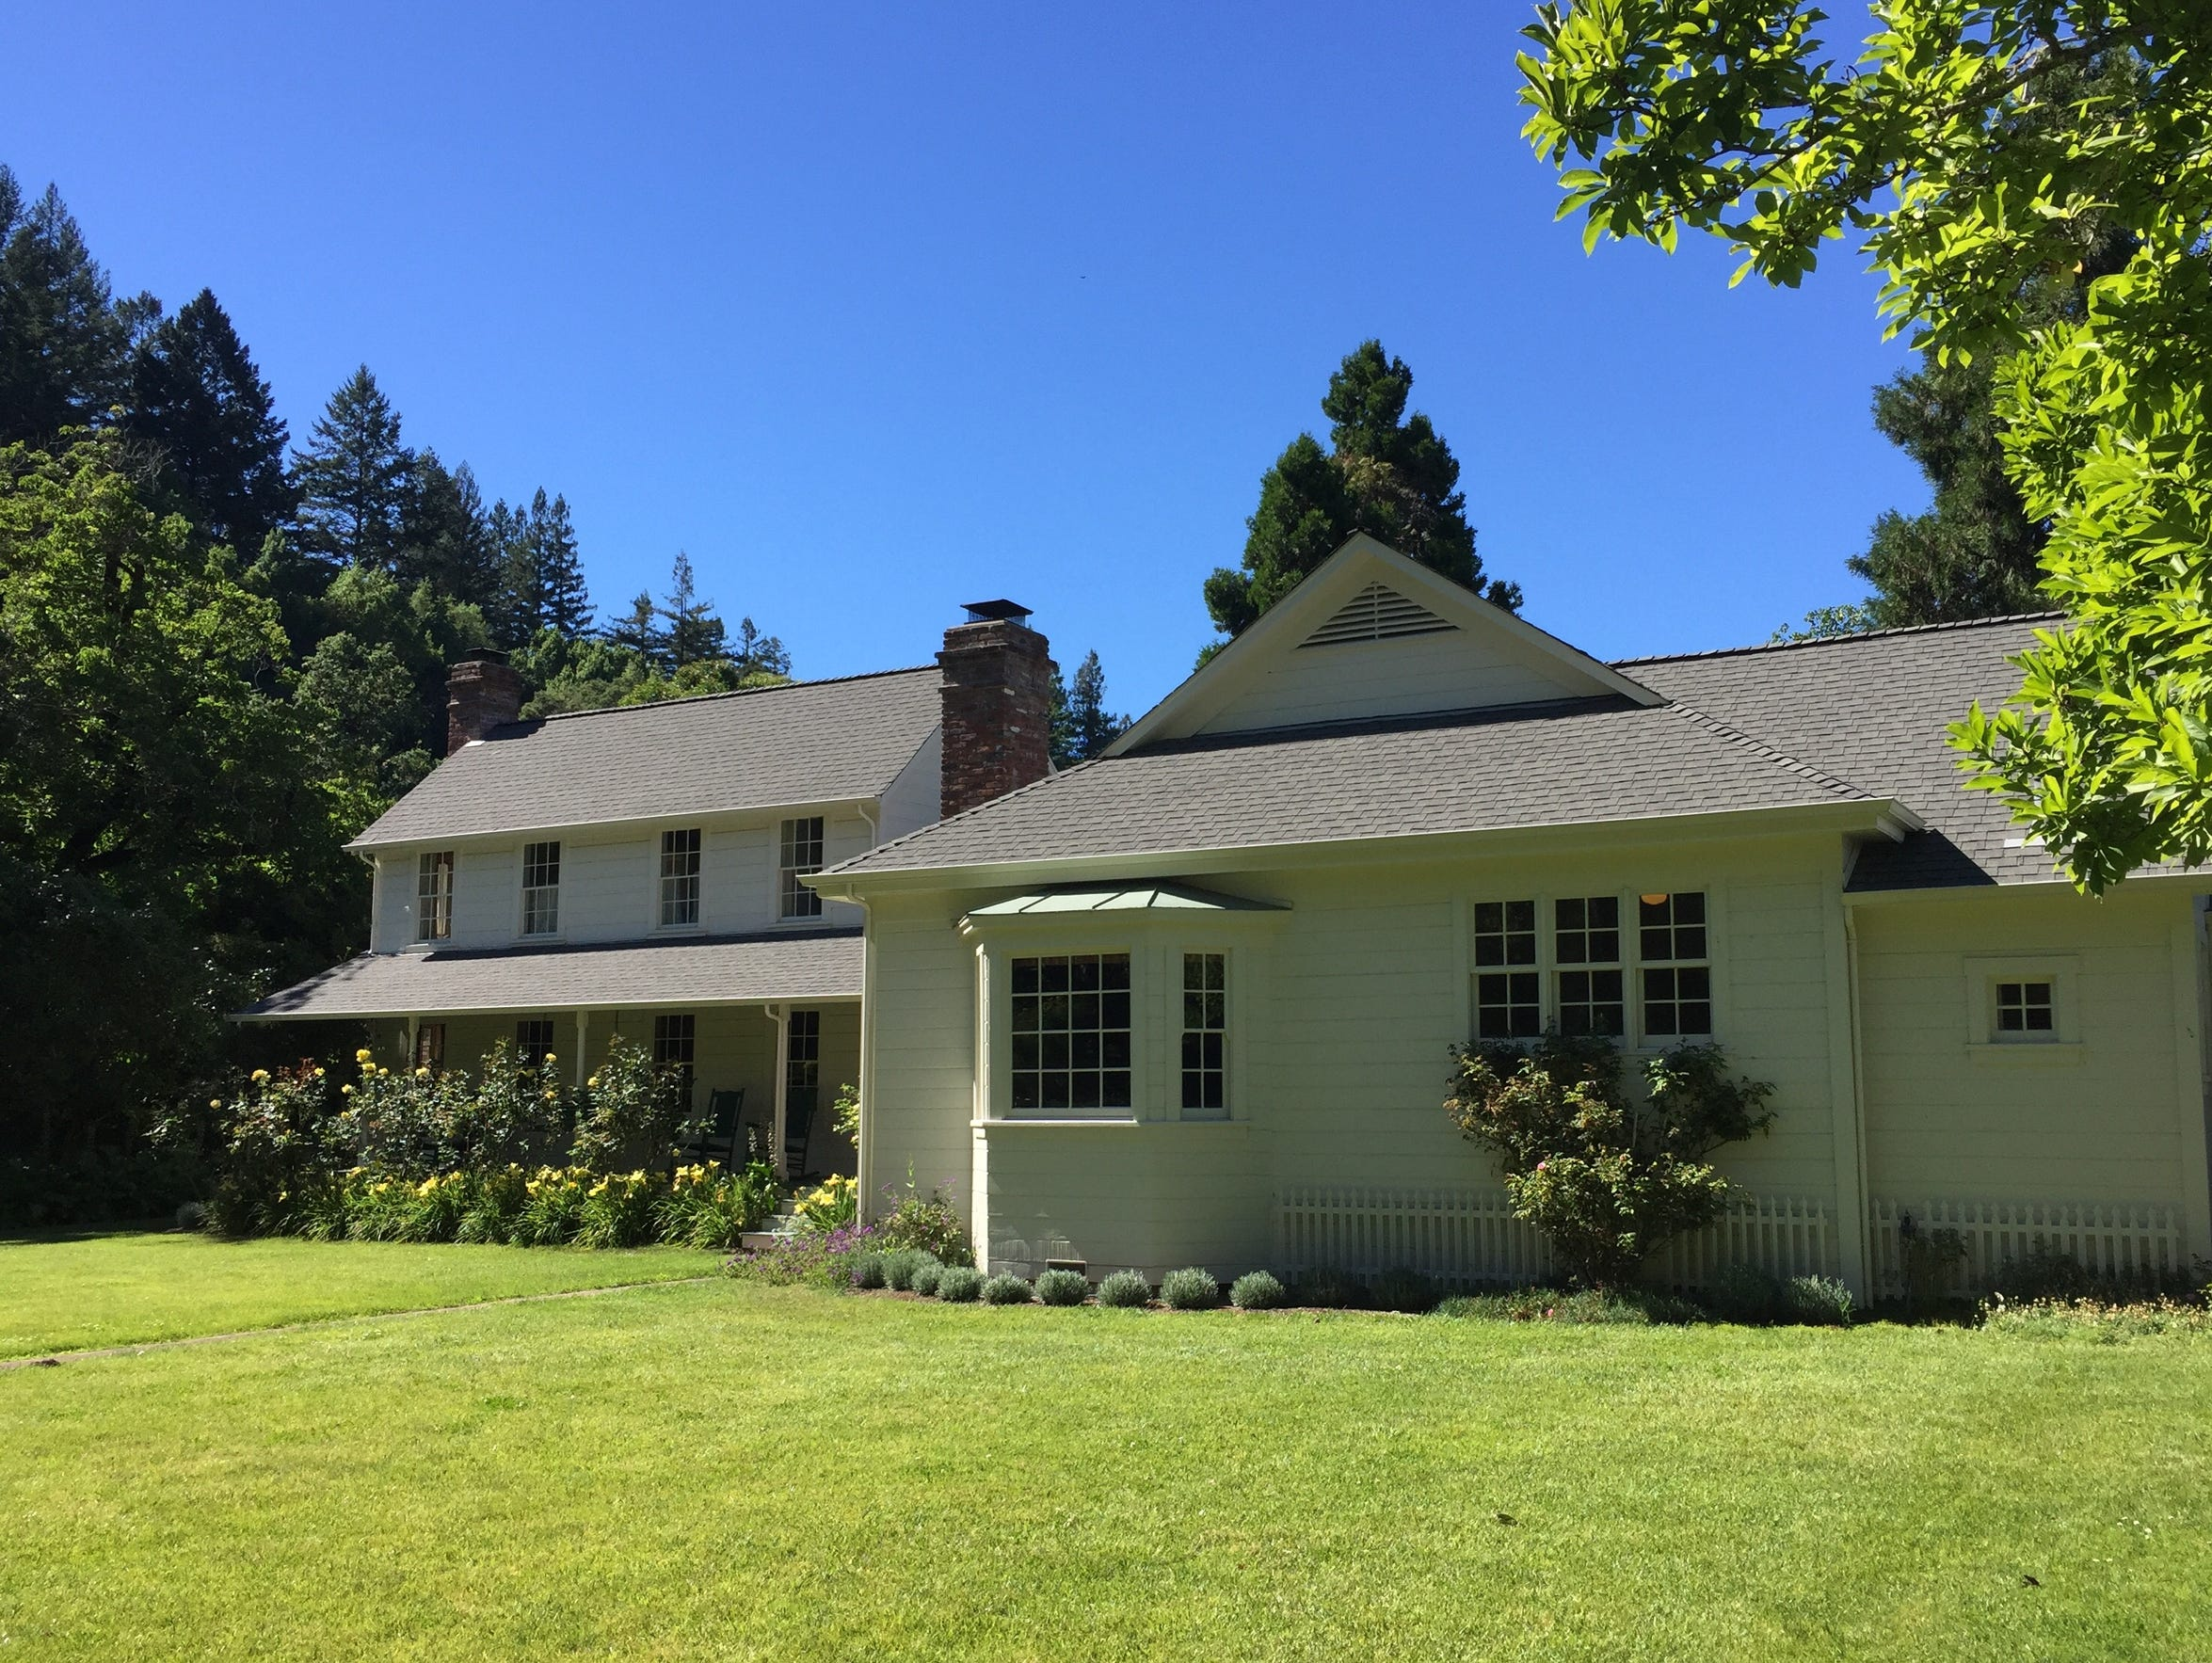 Historic ranch homes are still used at the MacMurray